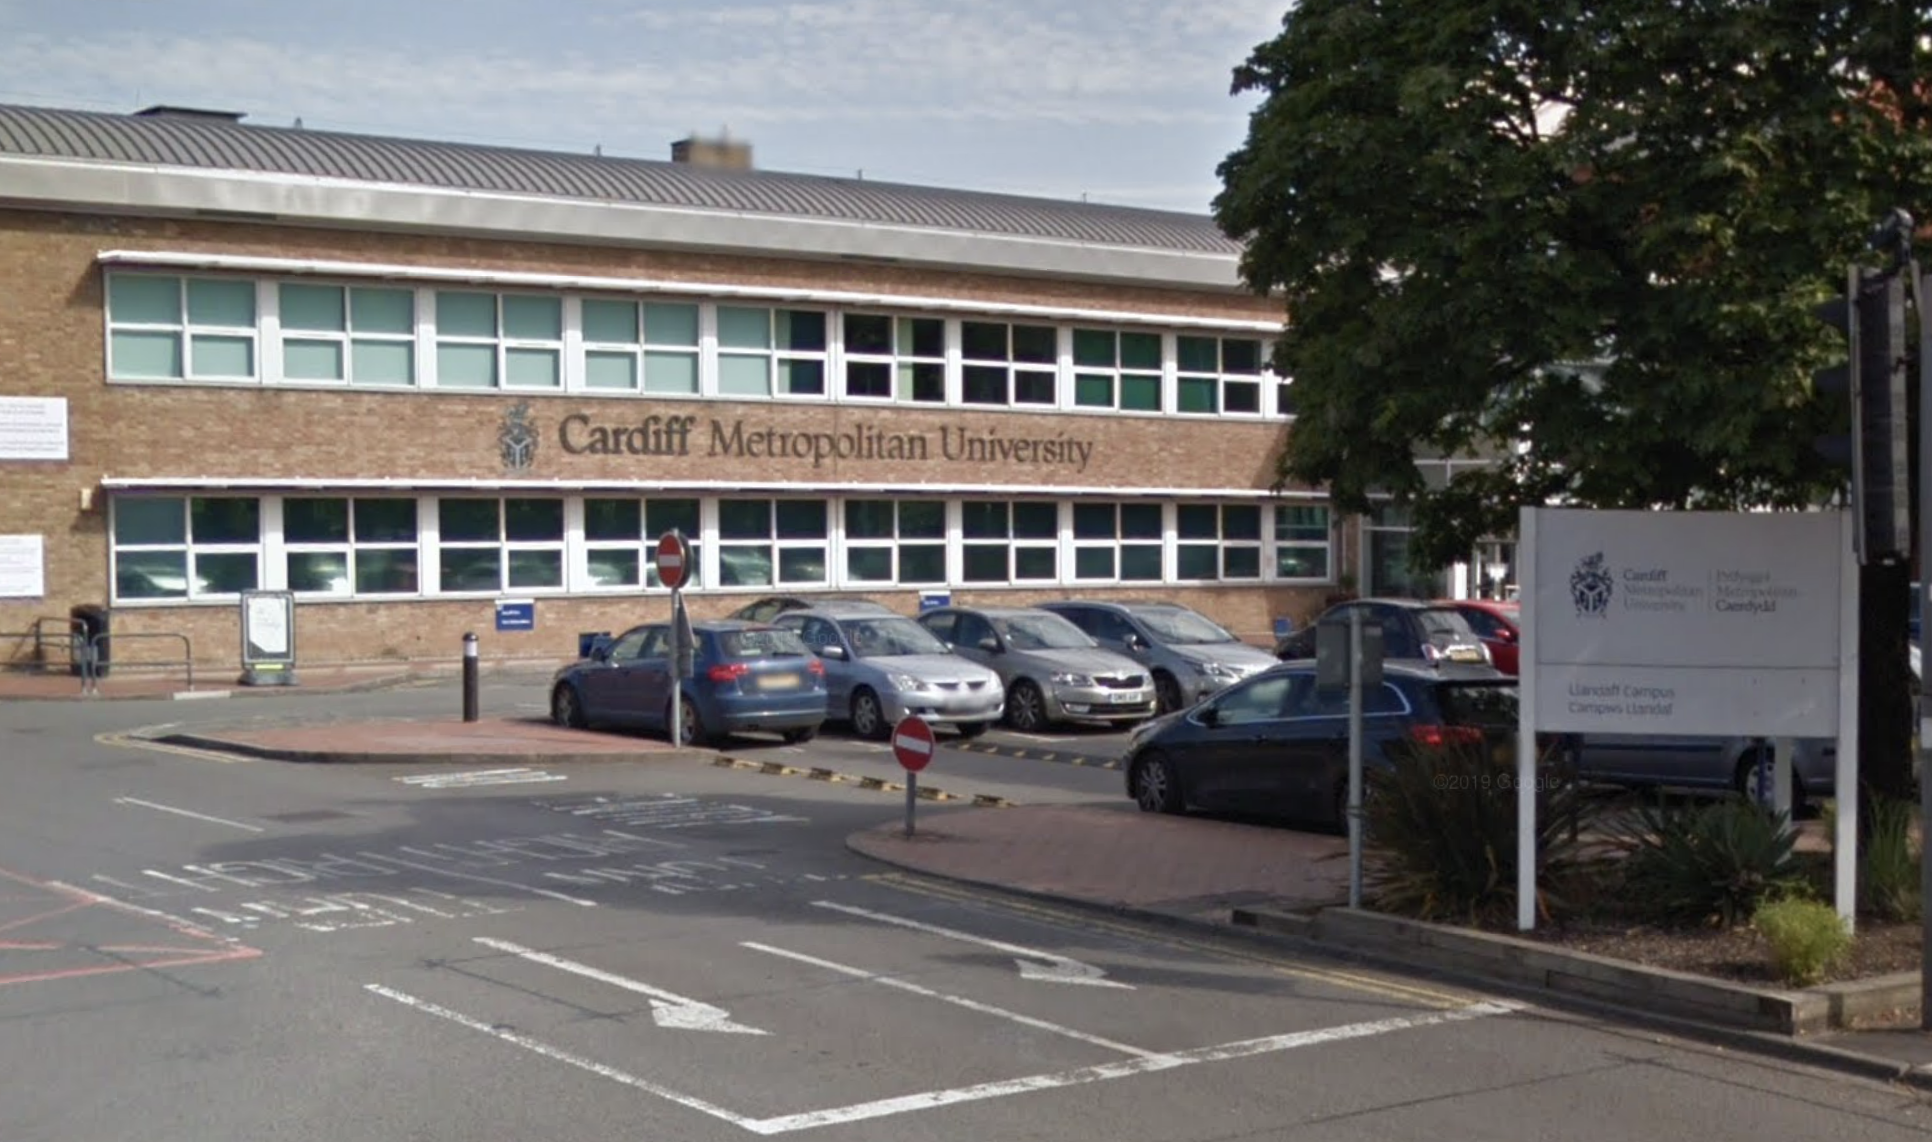 The students attend Cardiff Metropolitan University. (Google Maps)